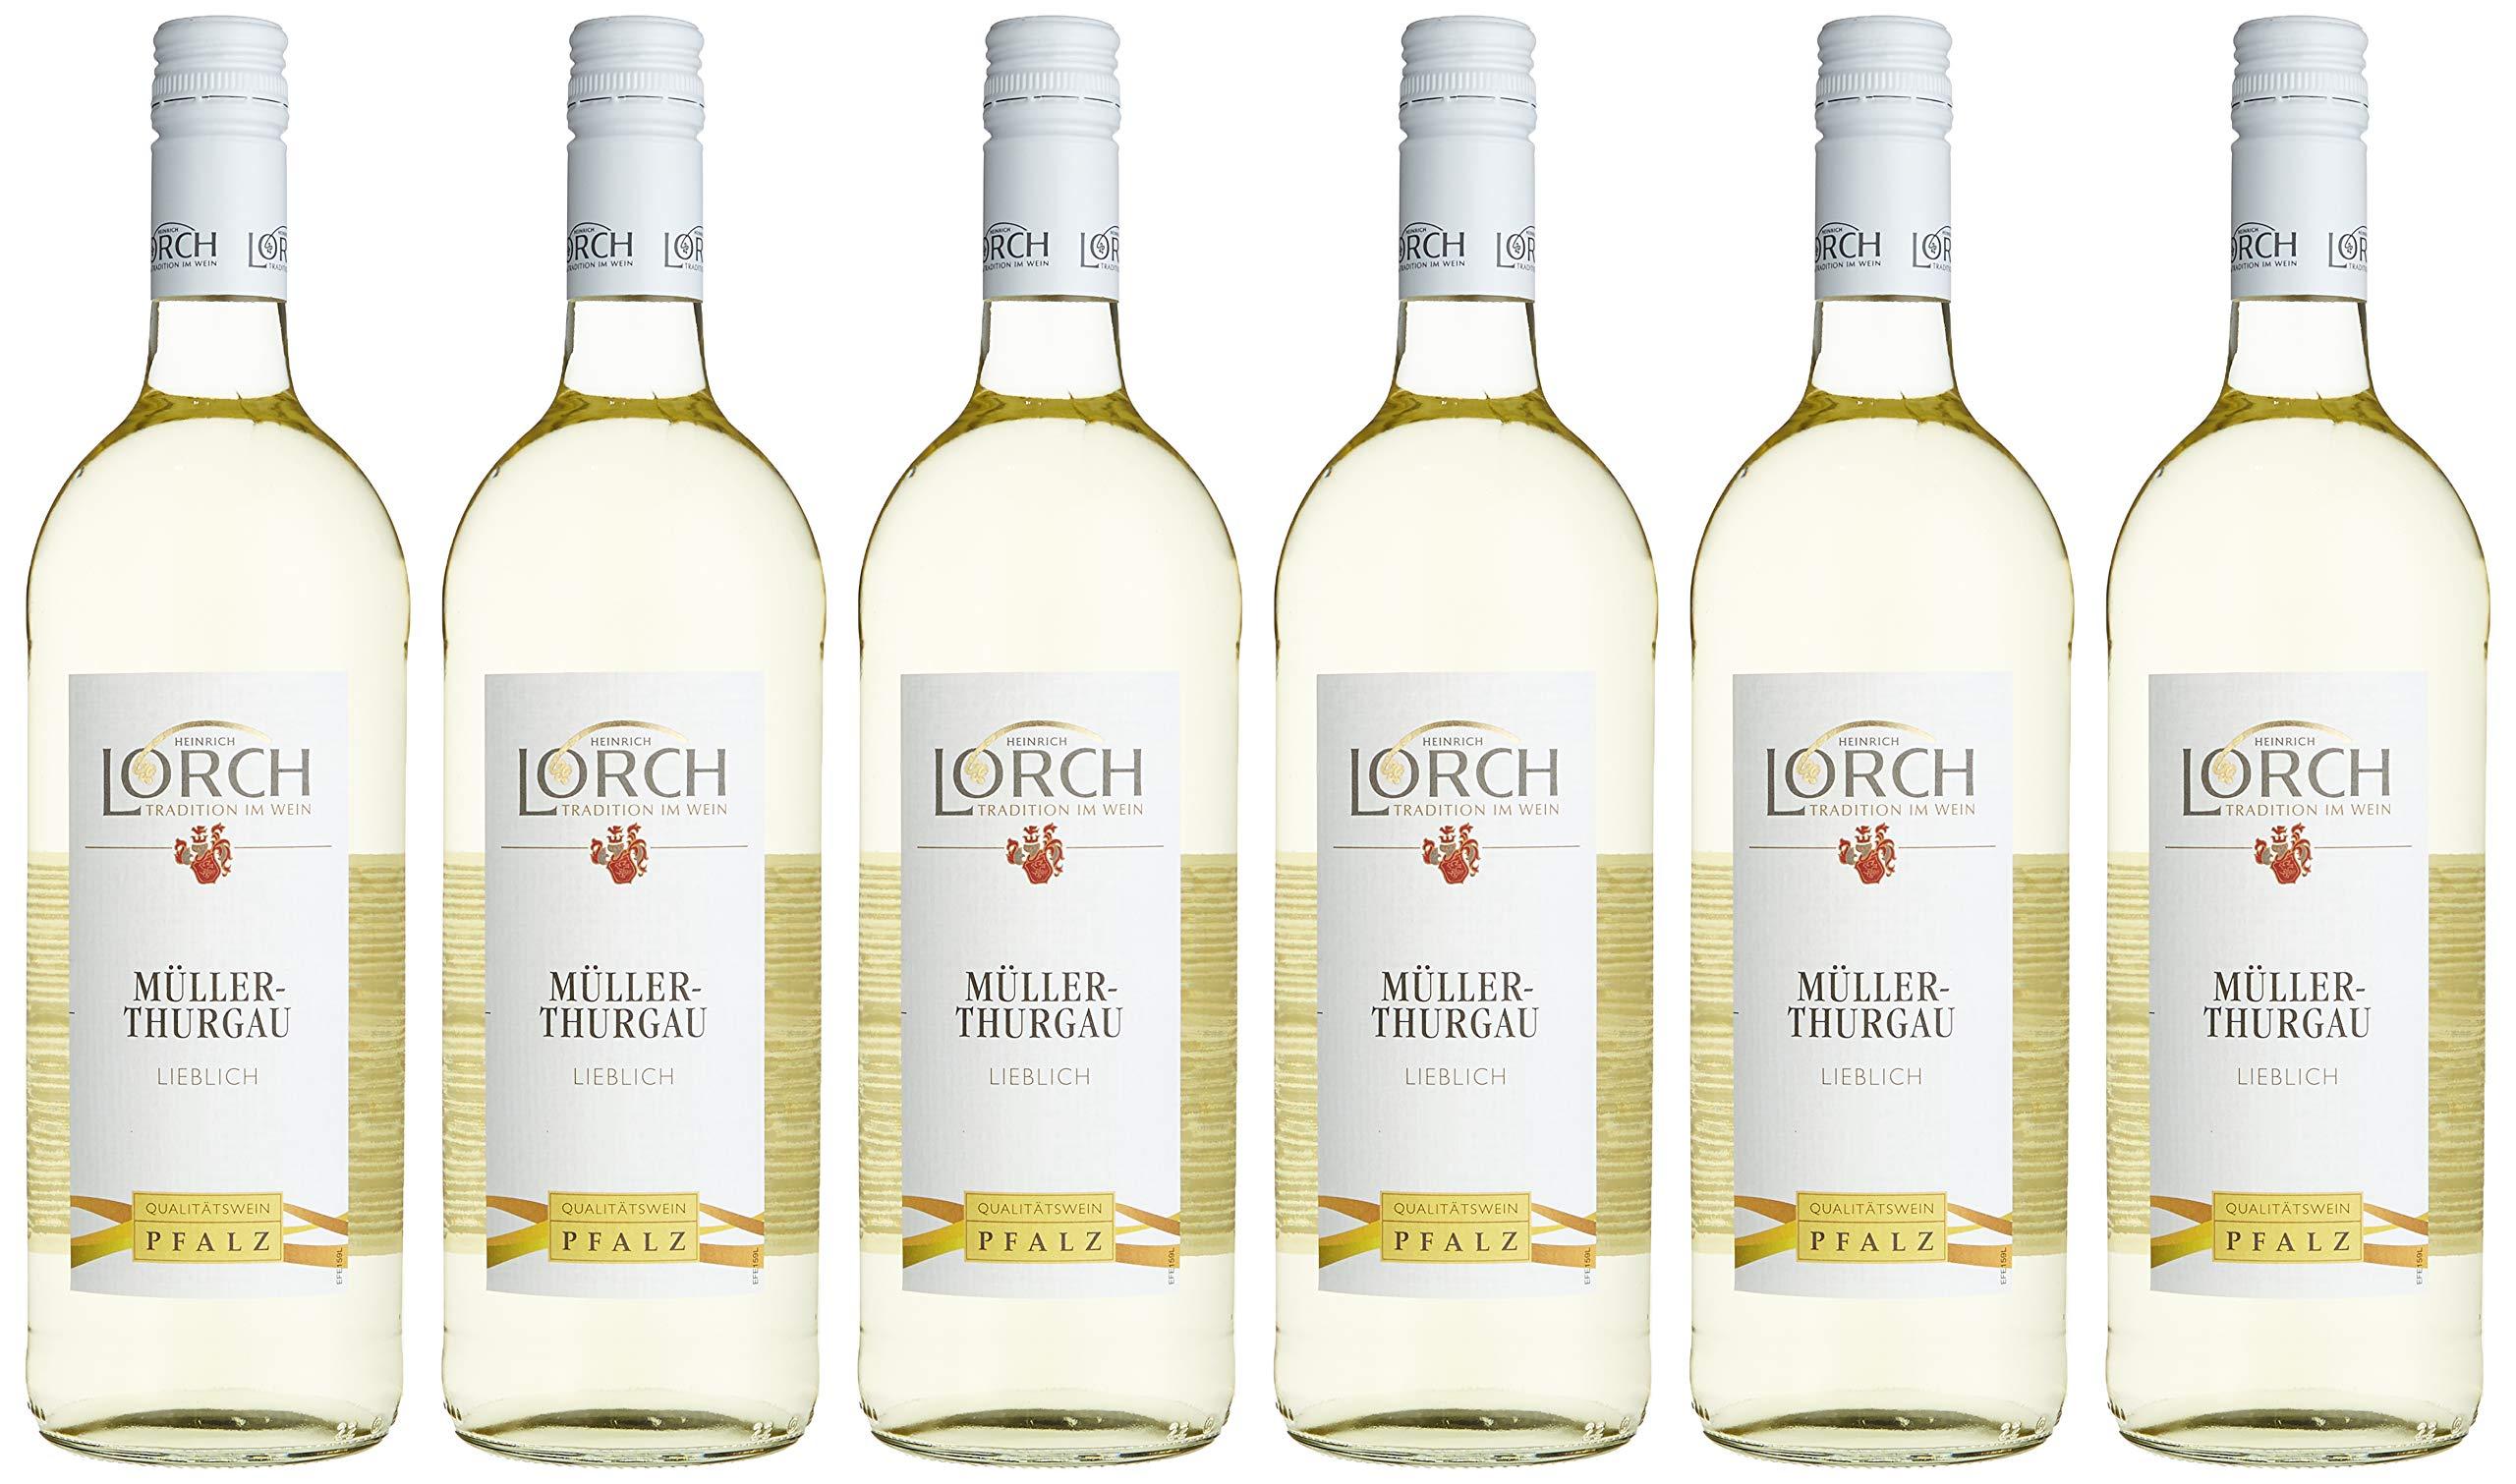 Lorch-Mller-Thurgau-Lieblich-6-x-10-l